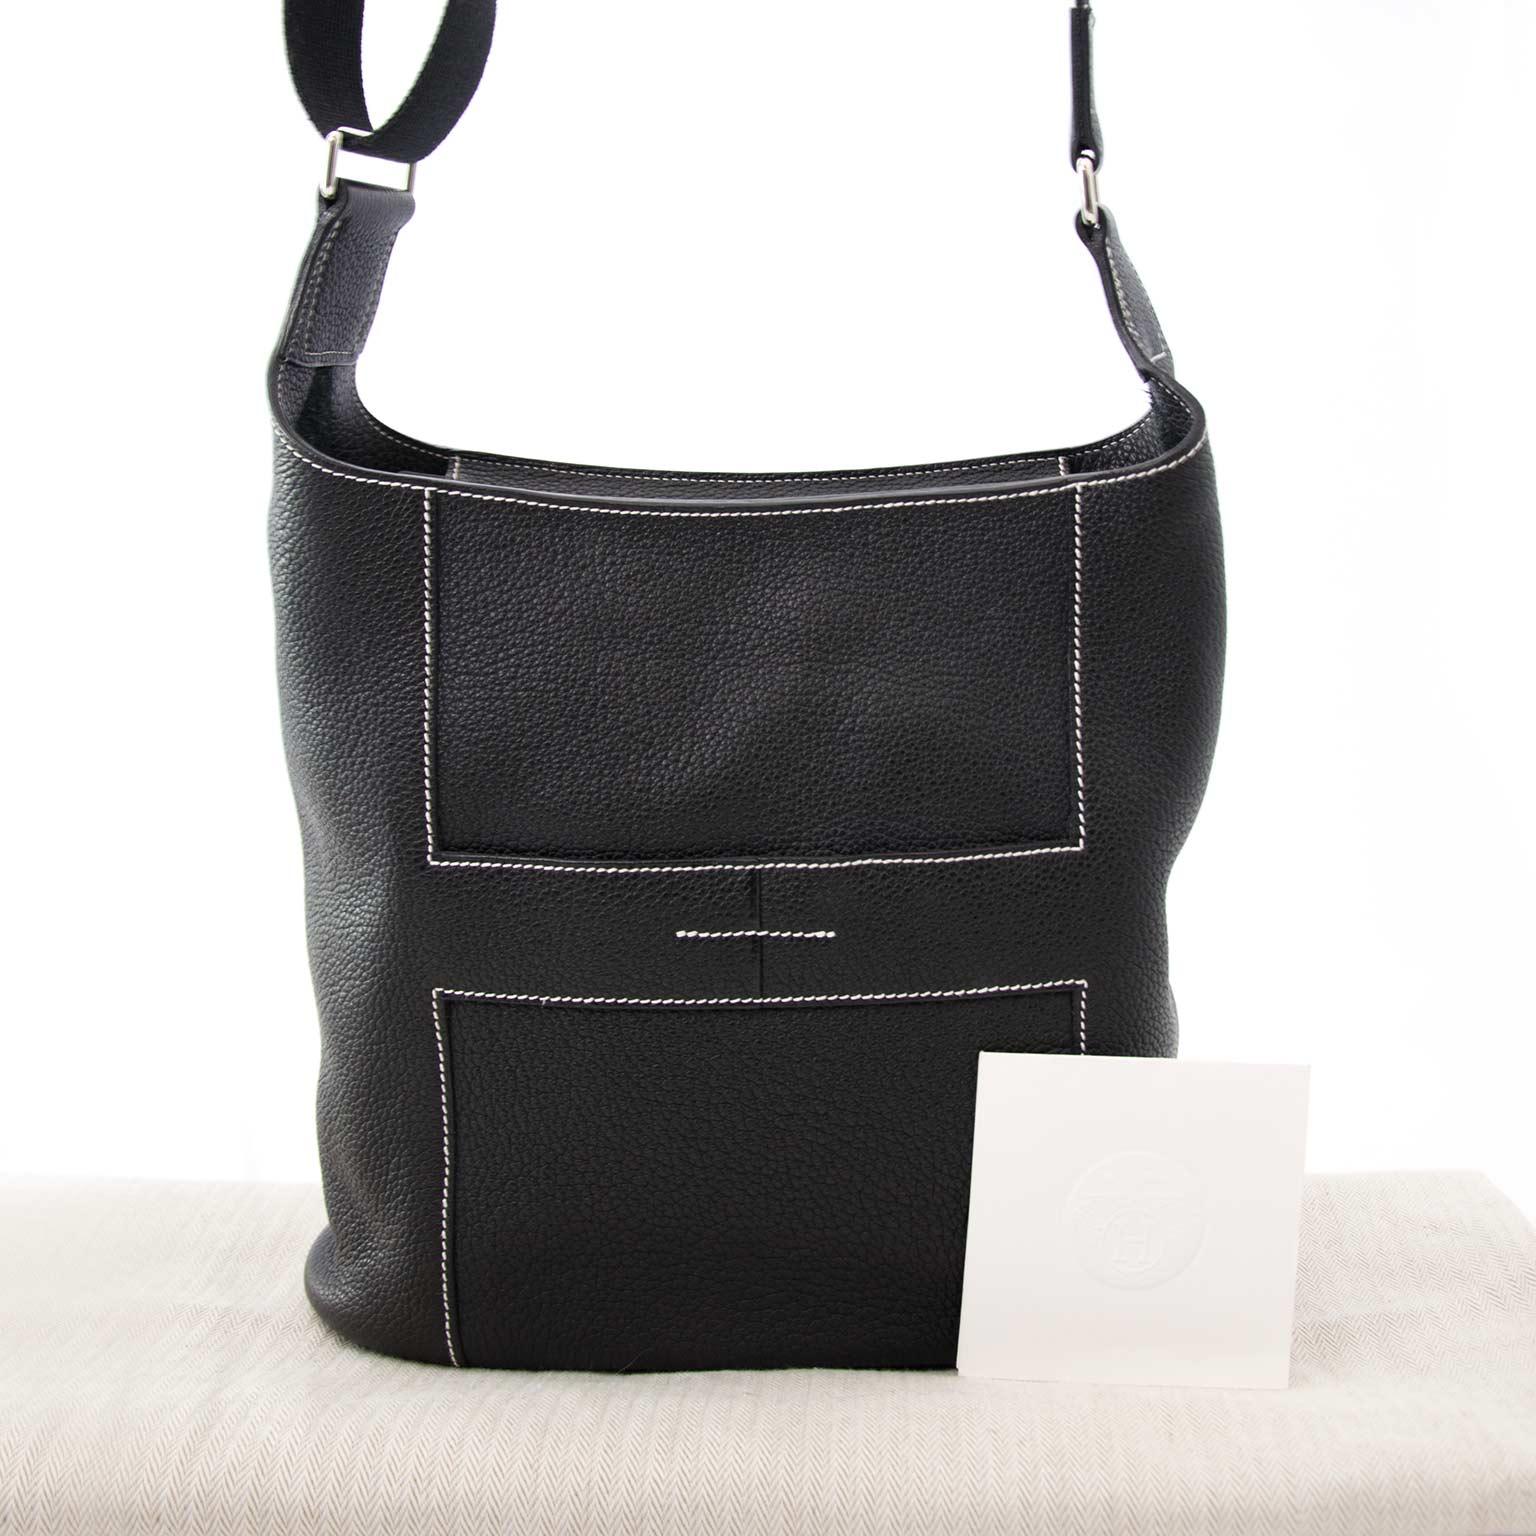 30a3c8a2e4b6 ... Hermès Black Goodnews Bag for sale online at Labellov.